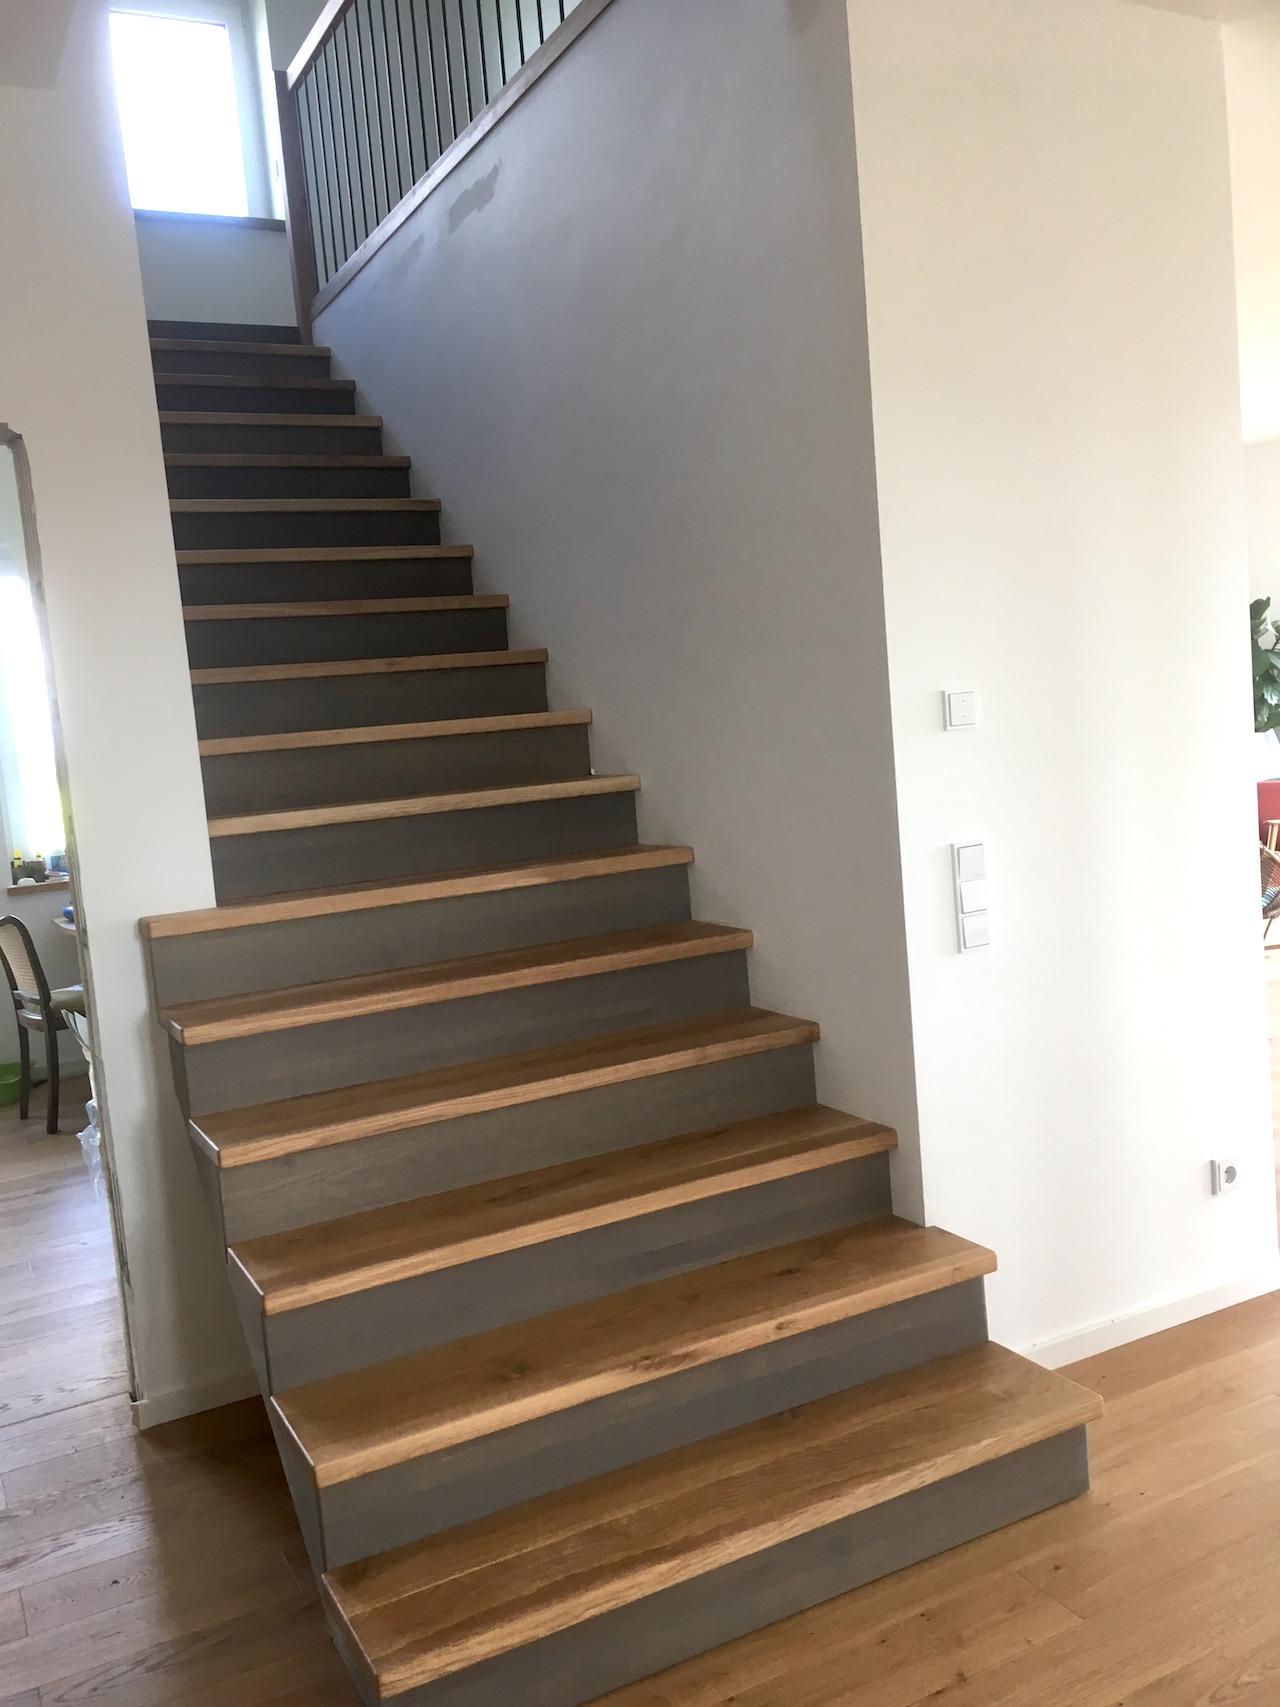 stufen auf betontreppe ihre treppenbau firma aus rostock. Black Bedroom Furniture Sets. Home Design Ideas